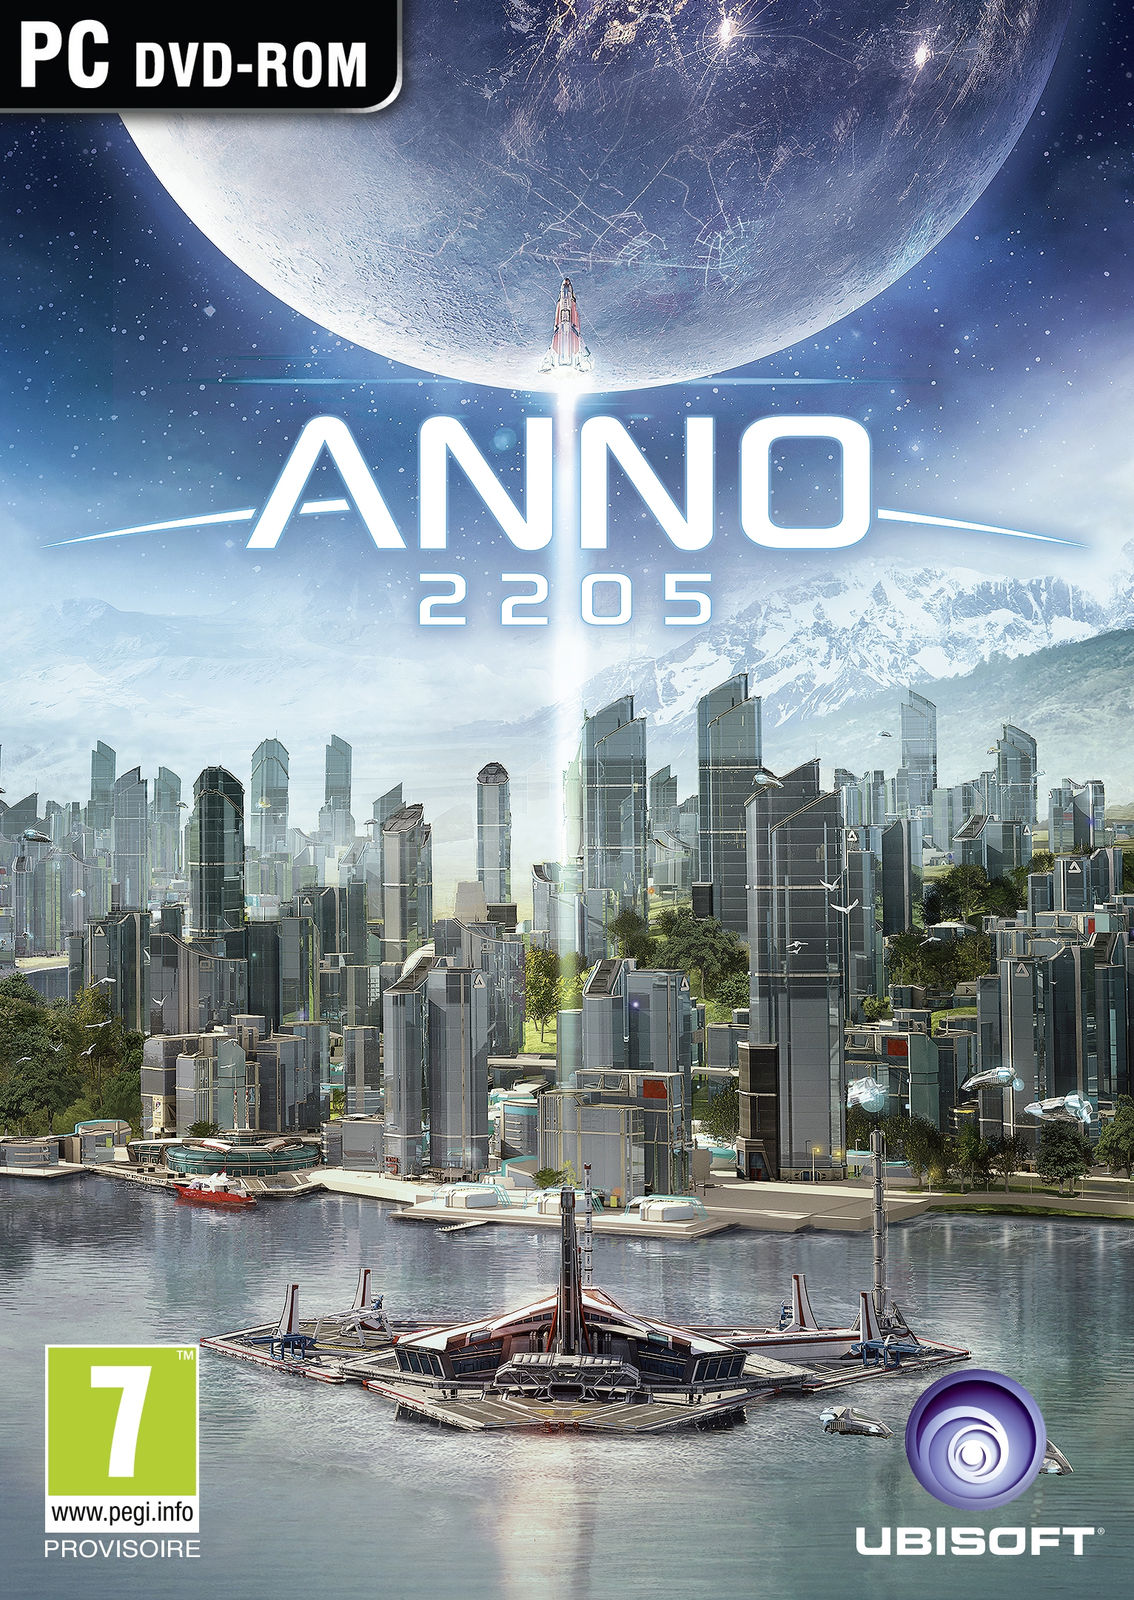 anno 2205 (uplay) ru/cis 335 rur